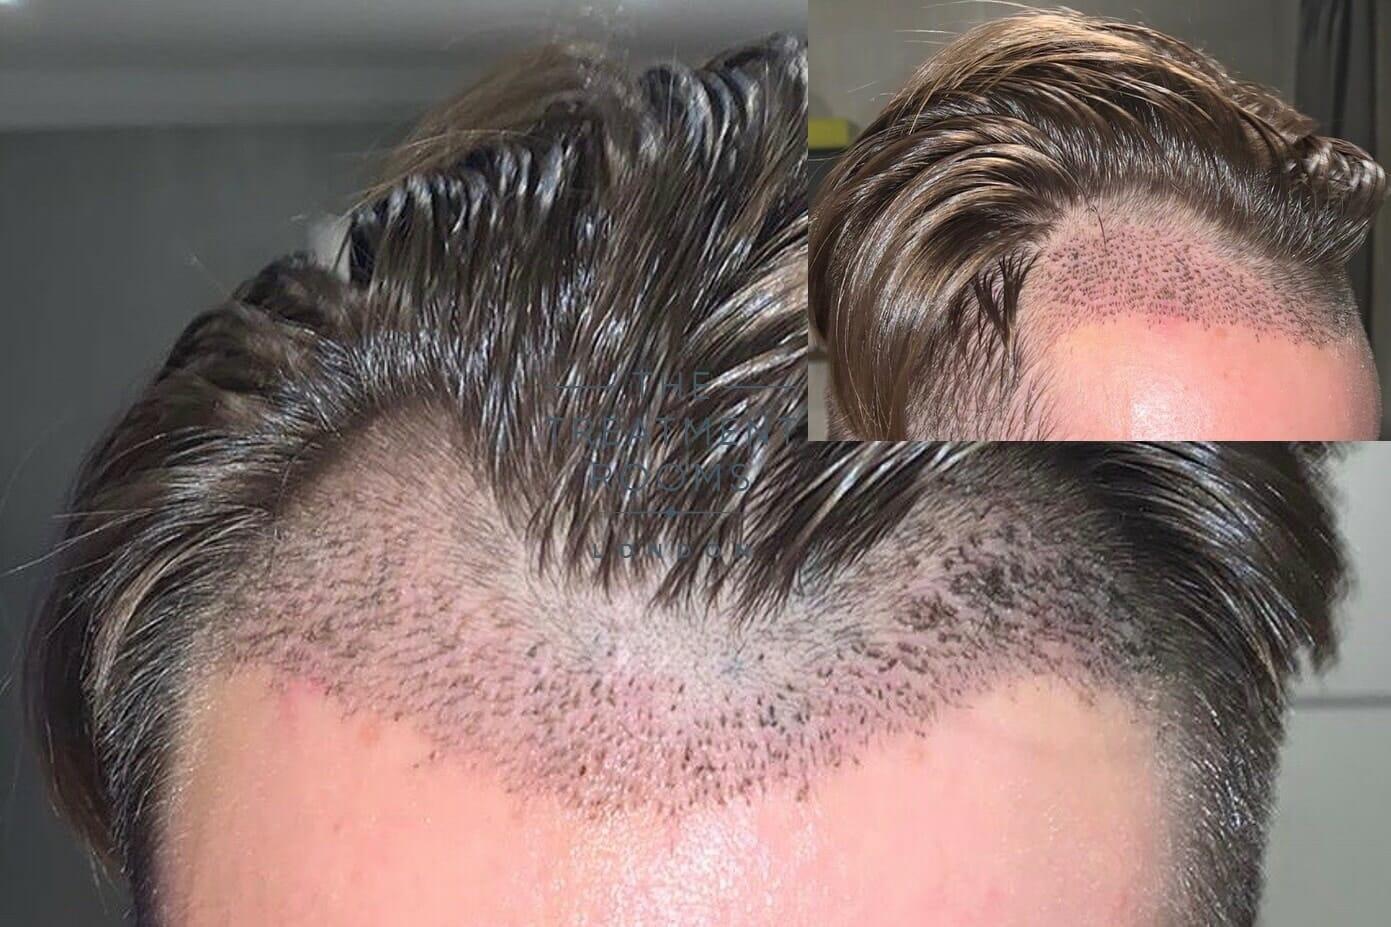 7 days post hair transplant